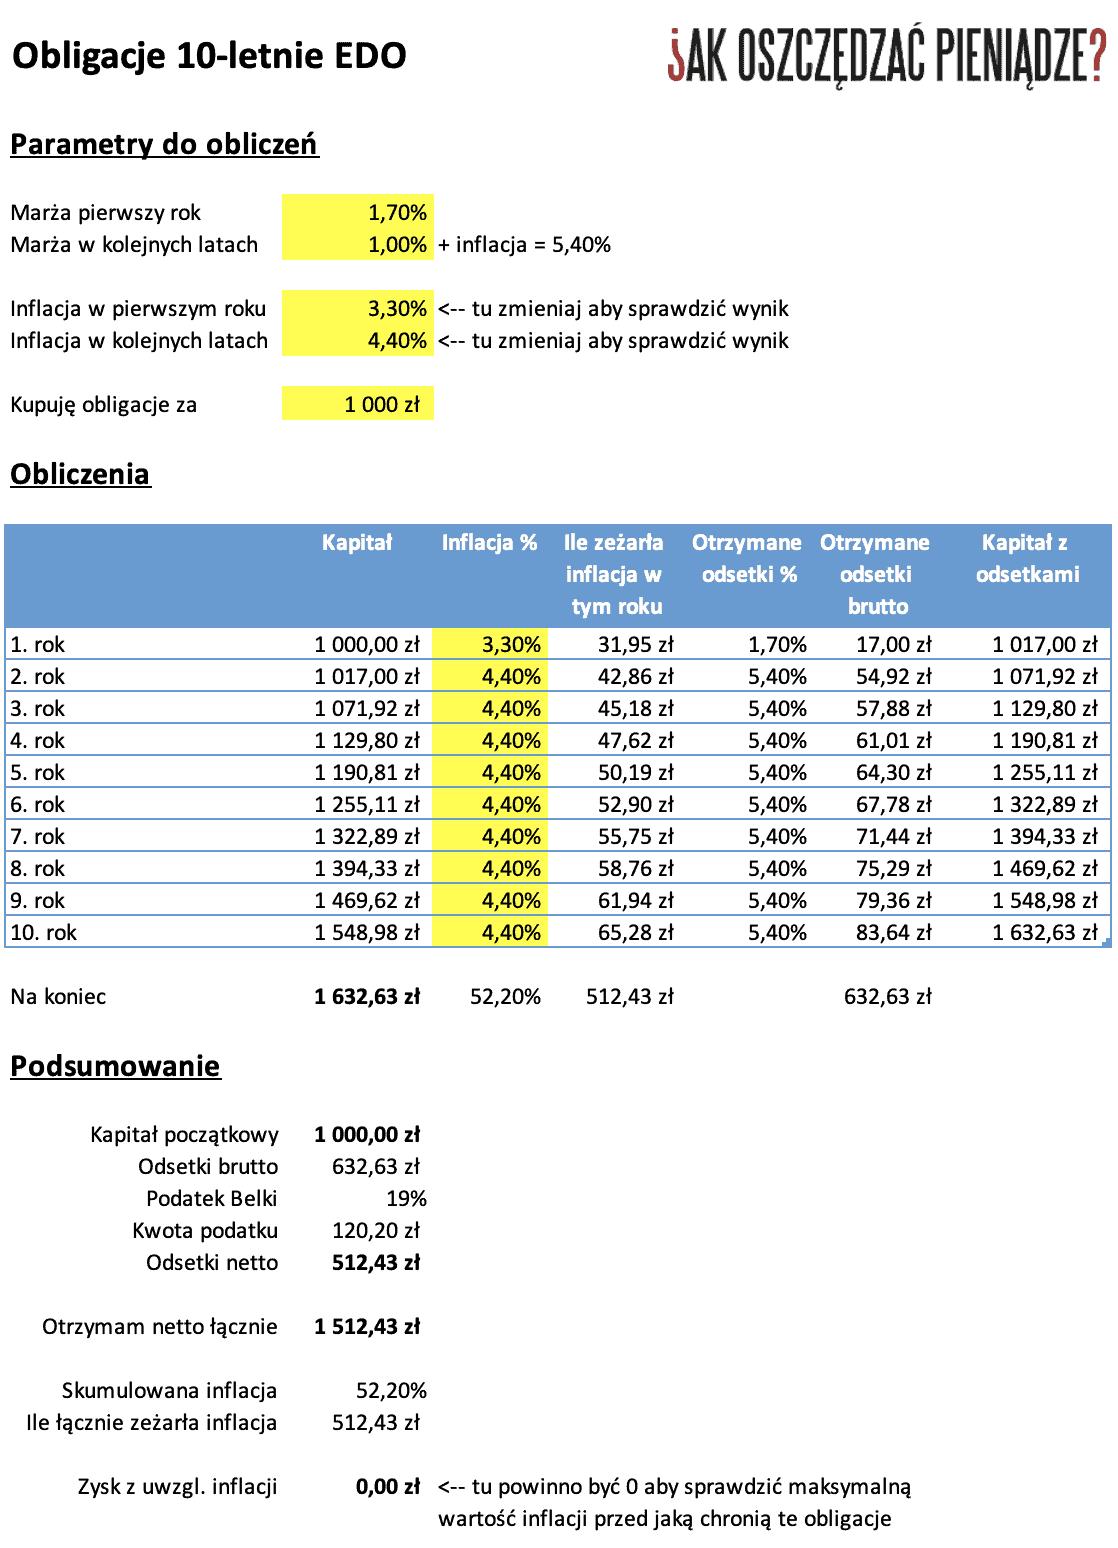 Obligacje 10-letnie EDO 2020